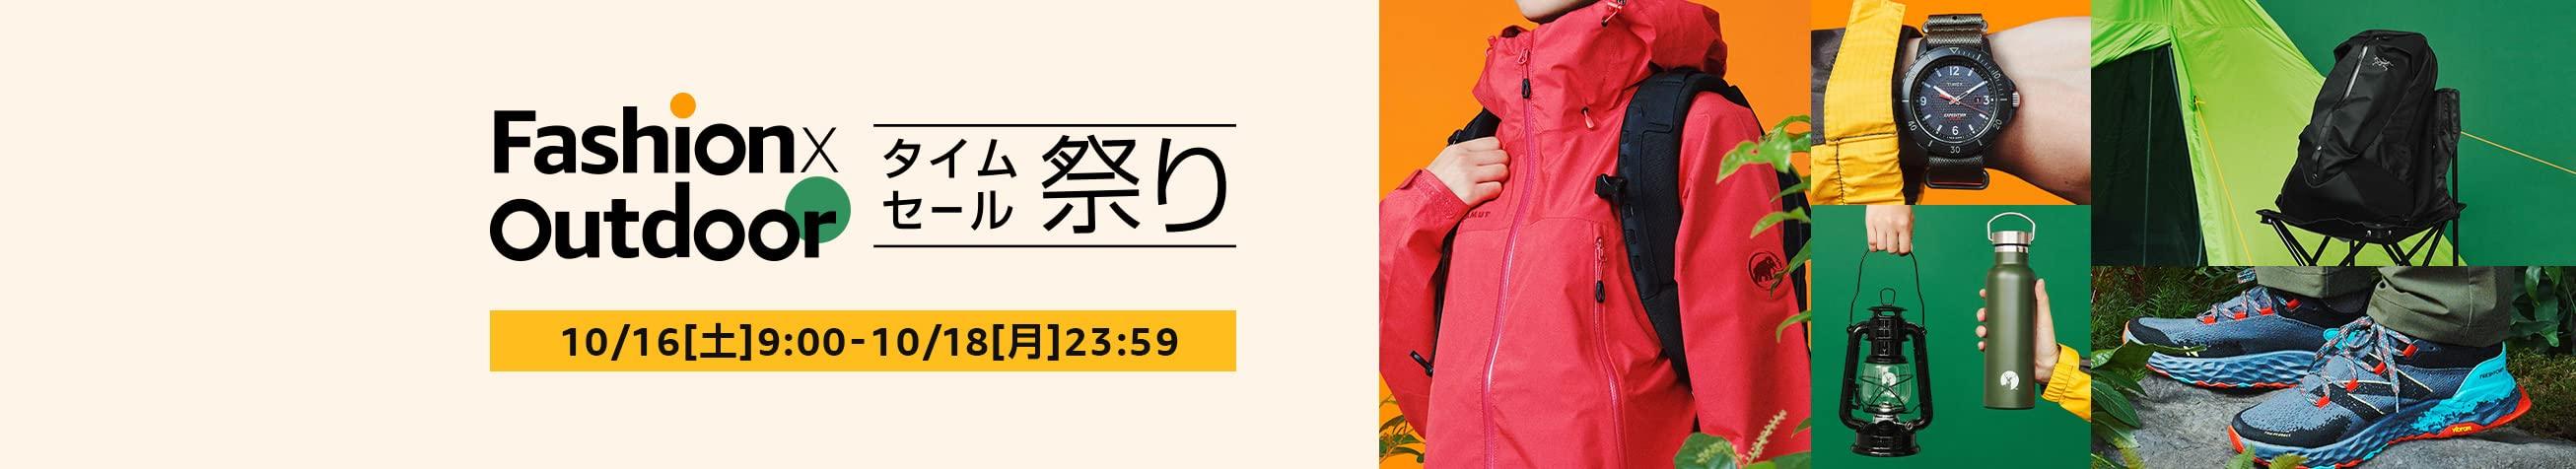 Fashion x Outdoorタイムセール祭り 10/16[土] 9:00 - 10/18[月] 23:59